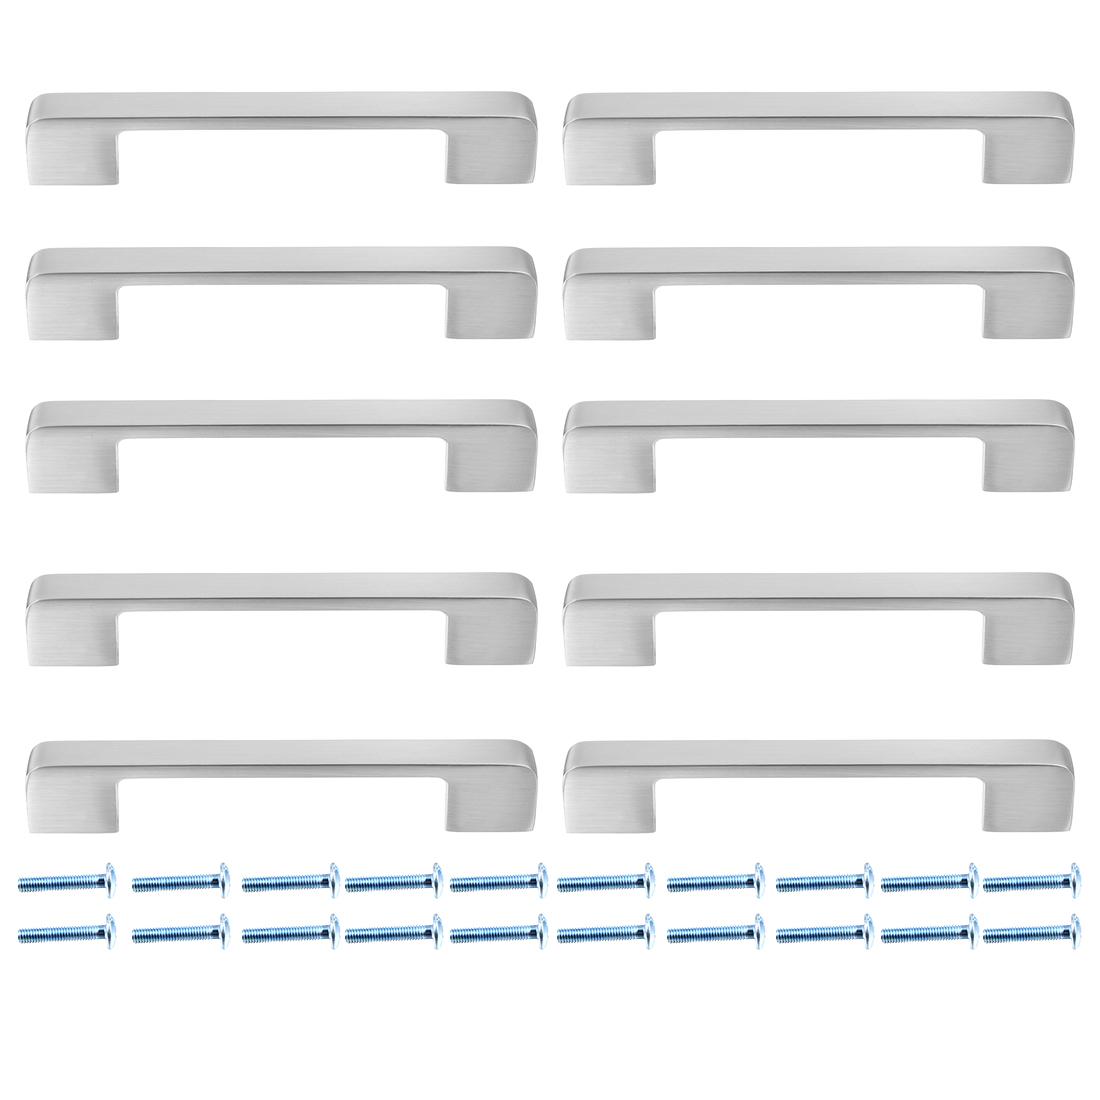 Cabinet Zinc Alloy Pull Handle 5 Inch Hole Centers Brushed Finish 10pcs